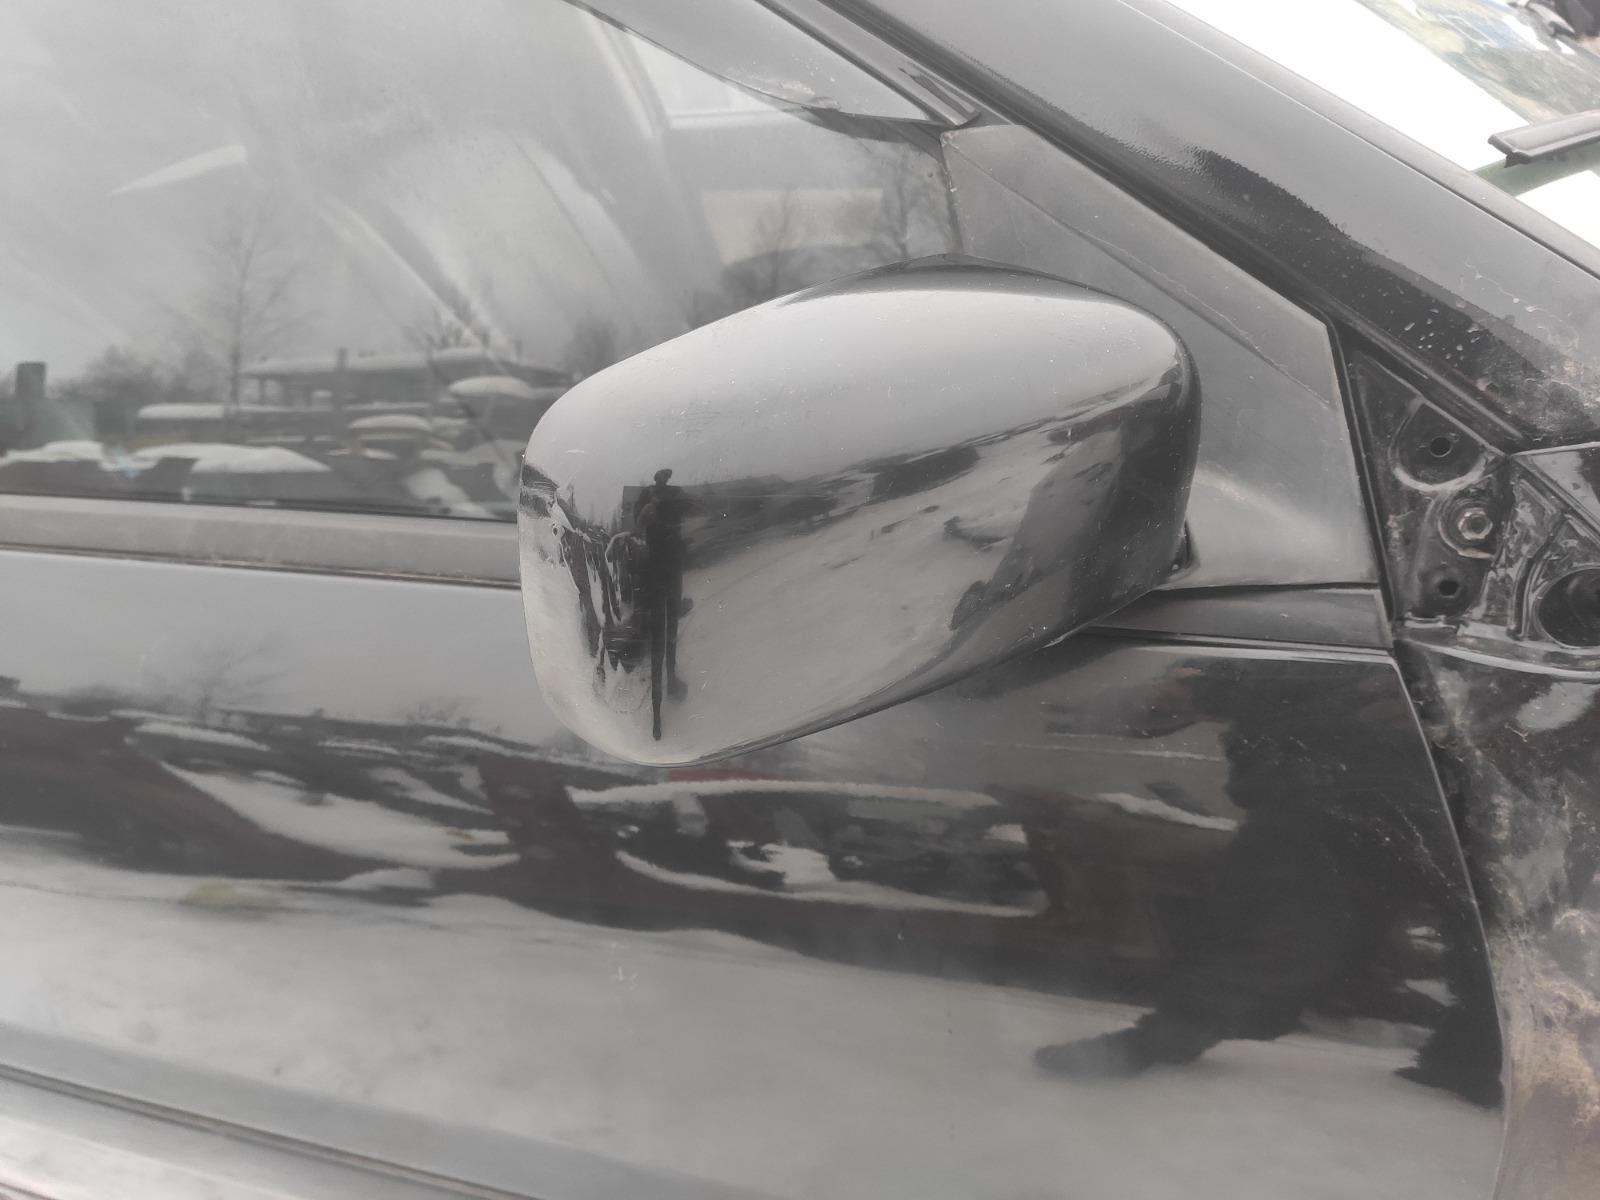 Зеркало заднего вида Mitsubishi Lancer 9 СЕДАН 1.6 2006 переднее правое (б/у)